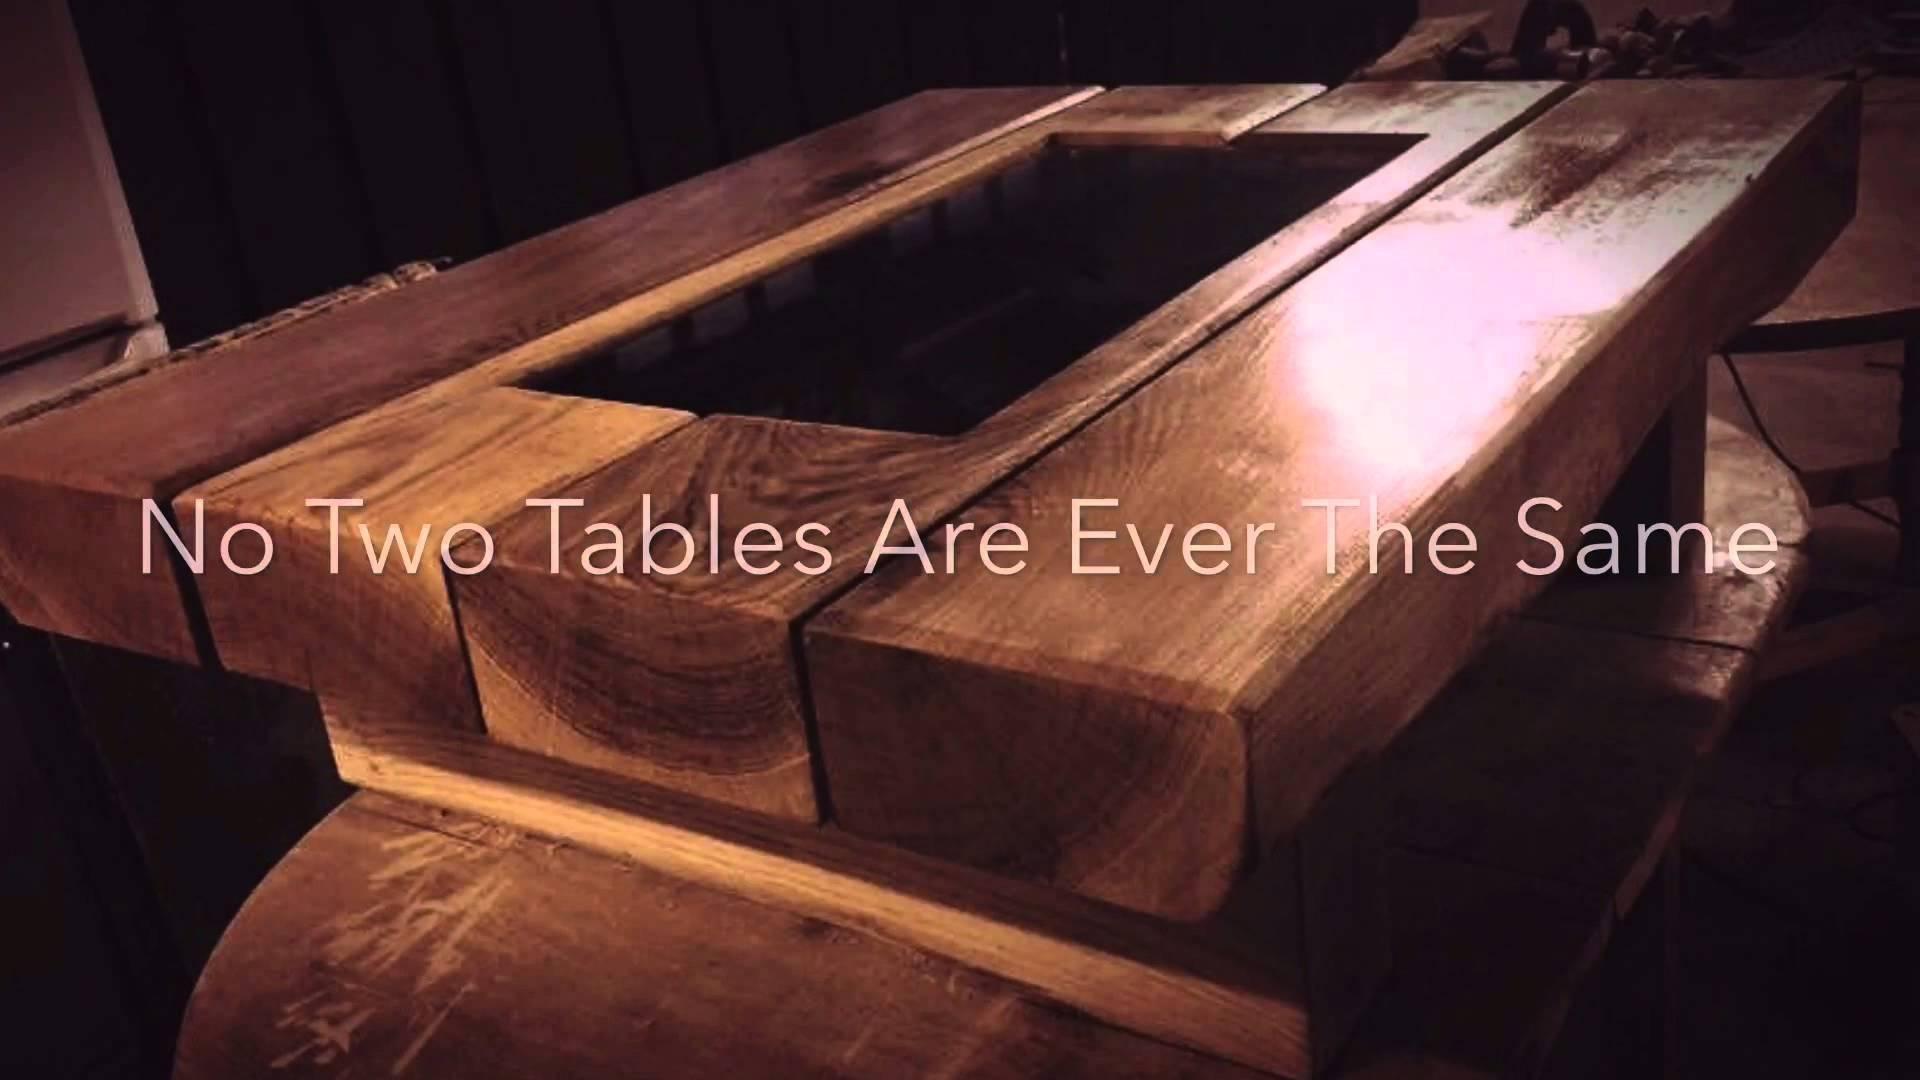 Railway Sleeper Table - Home Of The Chunky Oak Sleeper Coffee intended for Oak Sleeper Coffee Tables (Image 7 of 15)